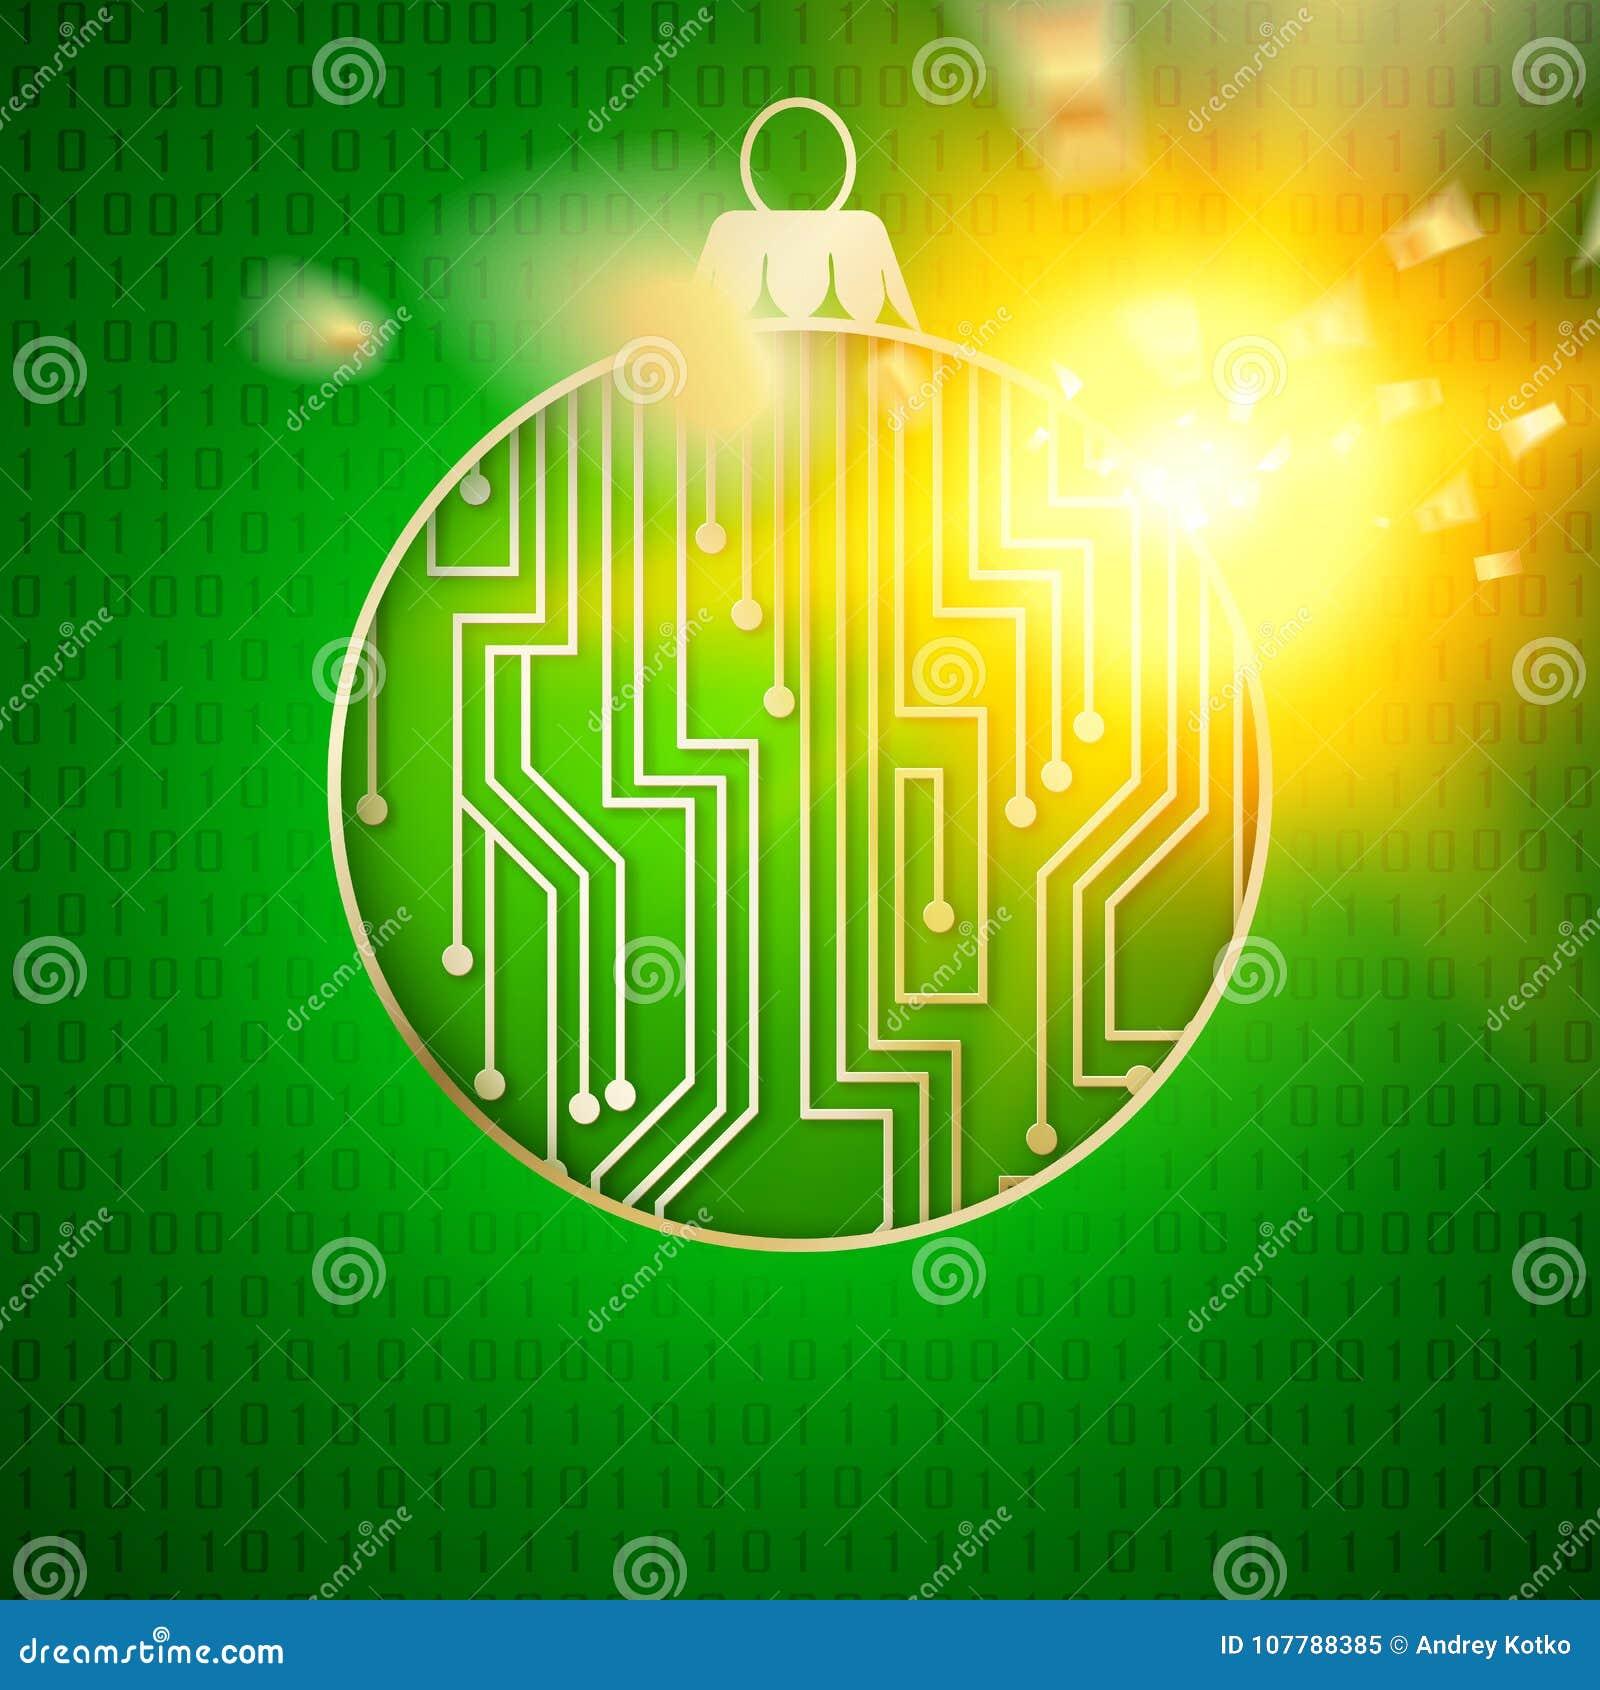 Digital christmas design. stock vector. Illustration of background ...